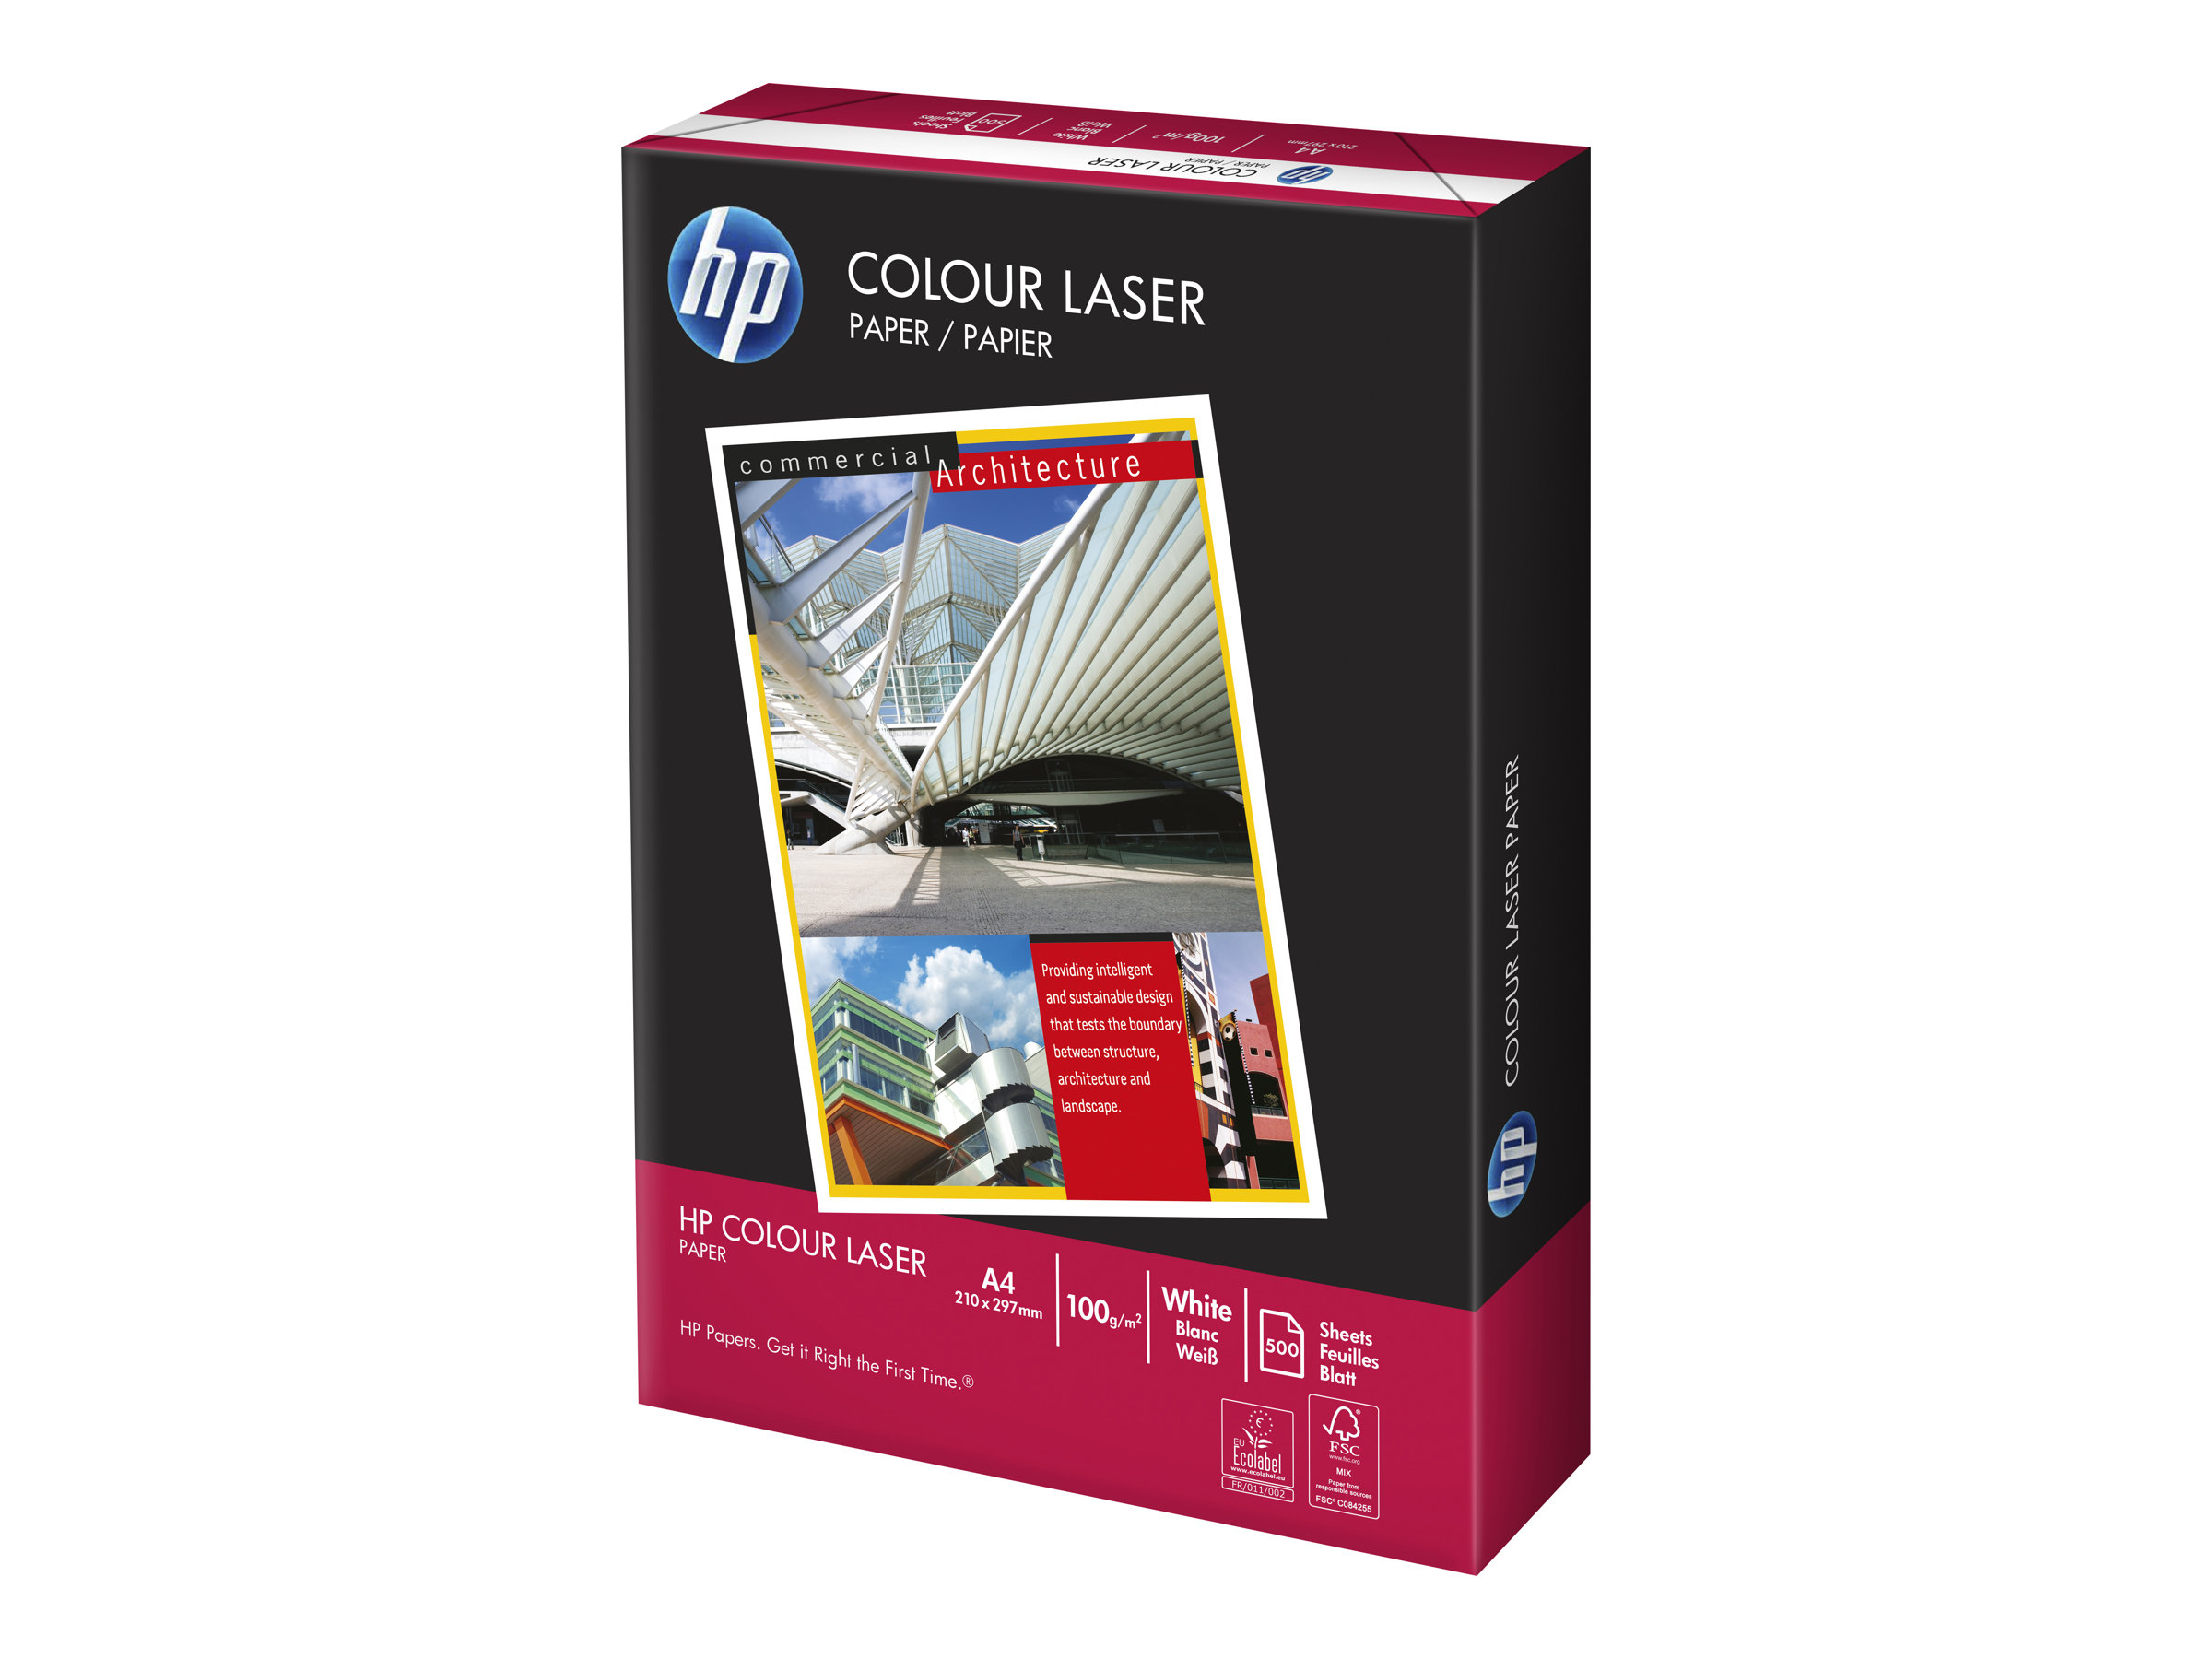 HP Color Laser Paper - A4 (210 x 297 mm)